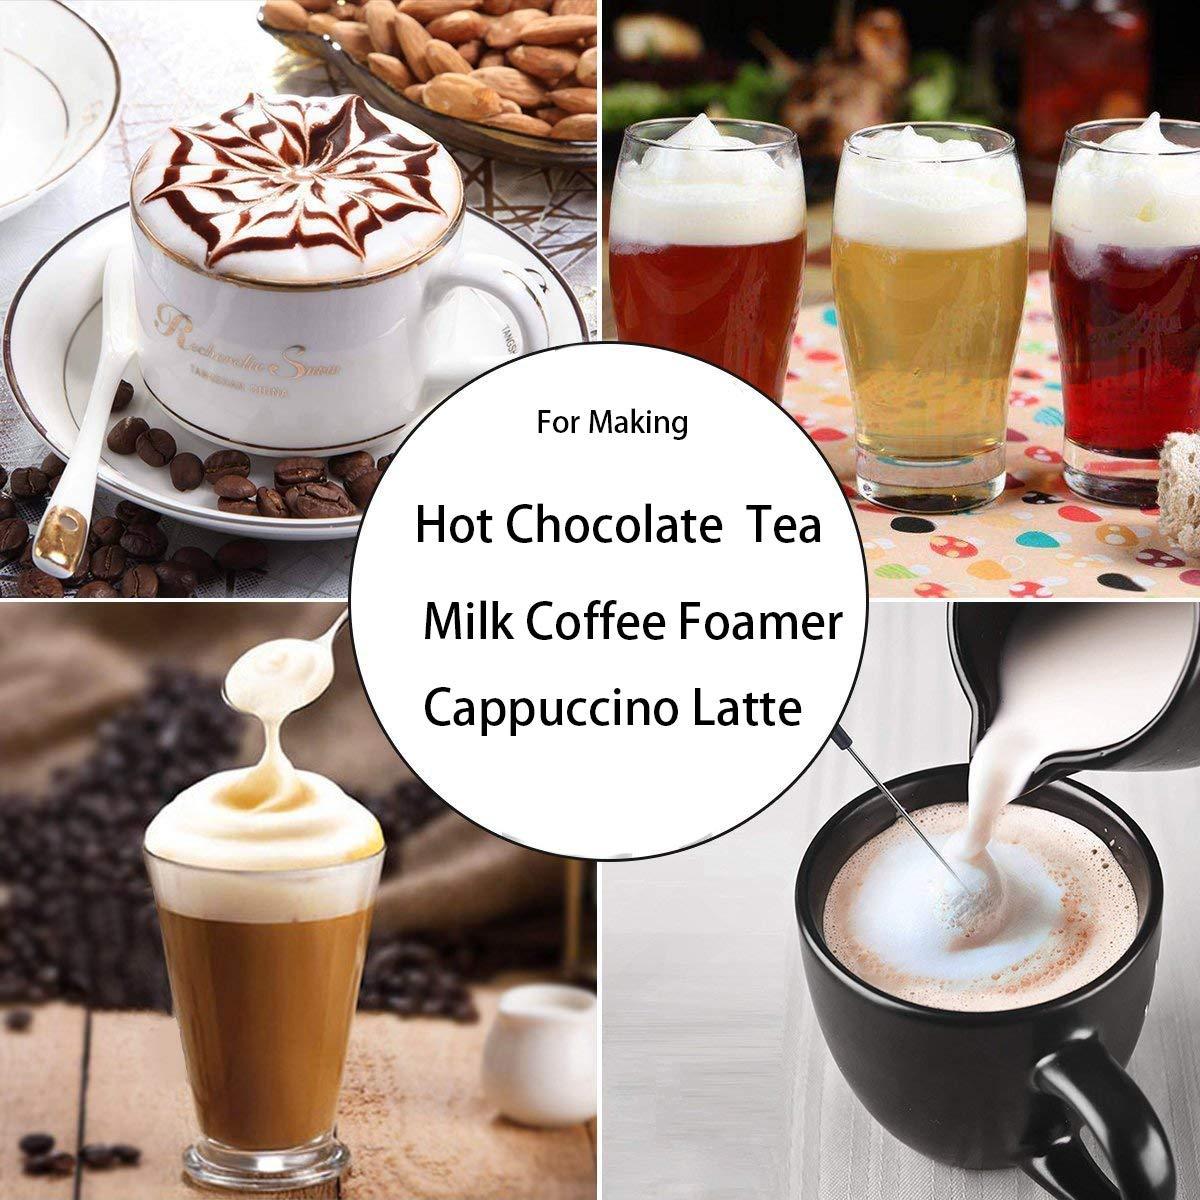 Automático de mano espumador de leche eléctrico funciona con pilas agitador andinor para barra de chocolate caliente café con leche hacer espuma de té café ...